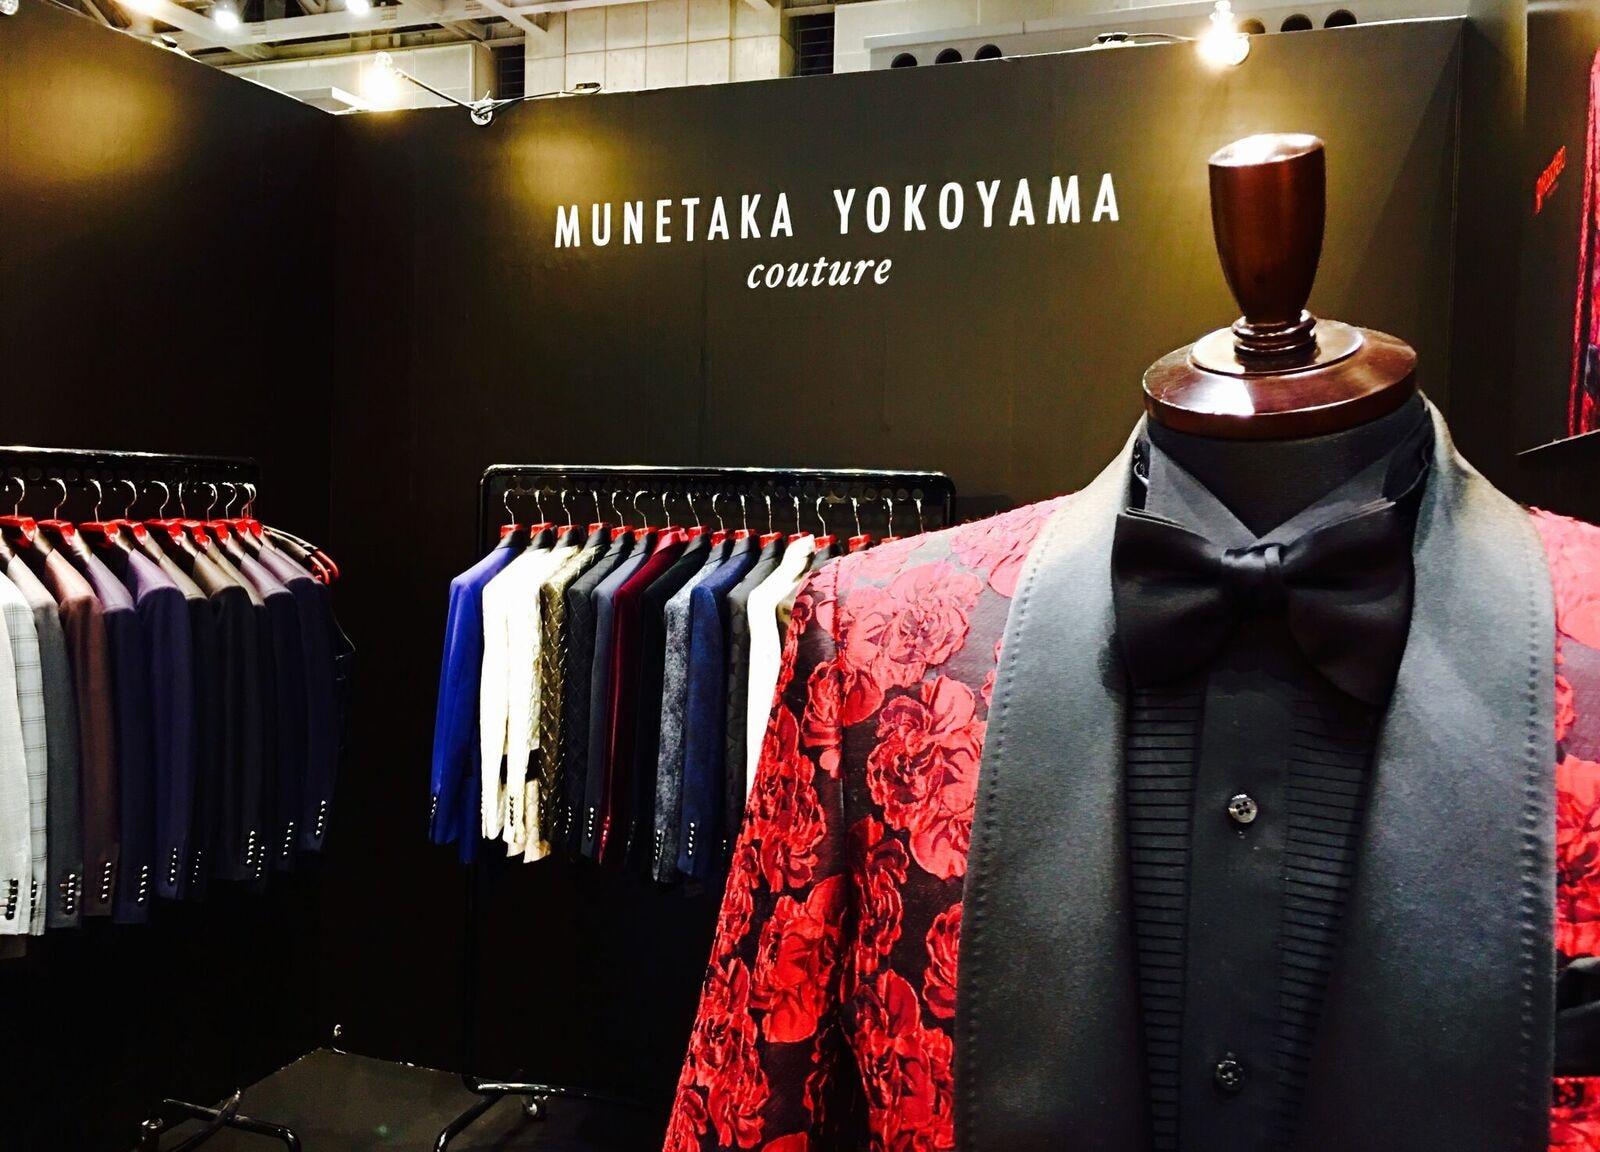 munetaka.yokoyama.couture.オーダータキシード